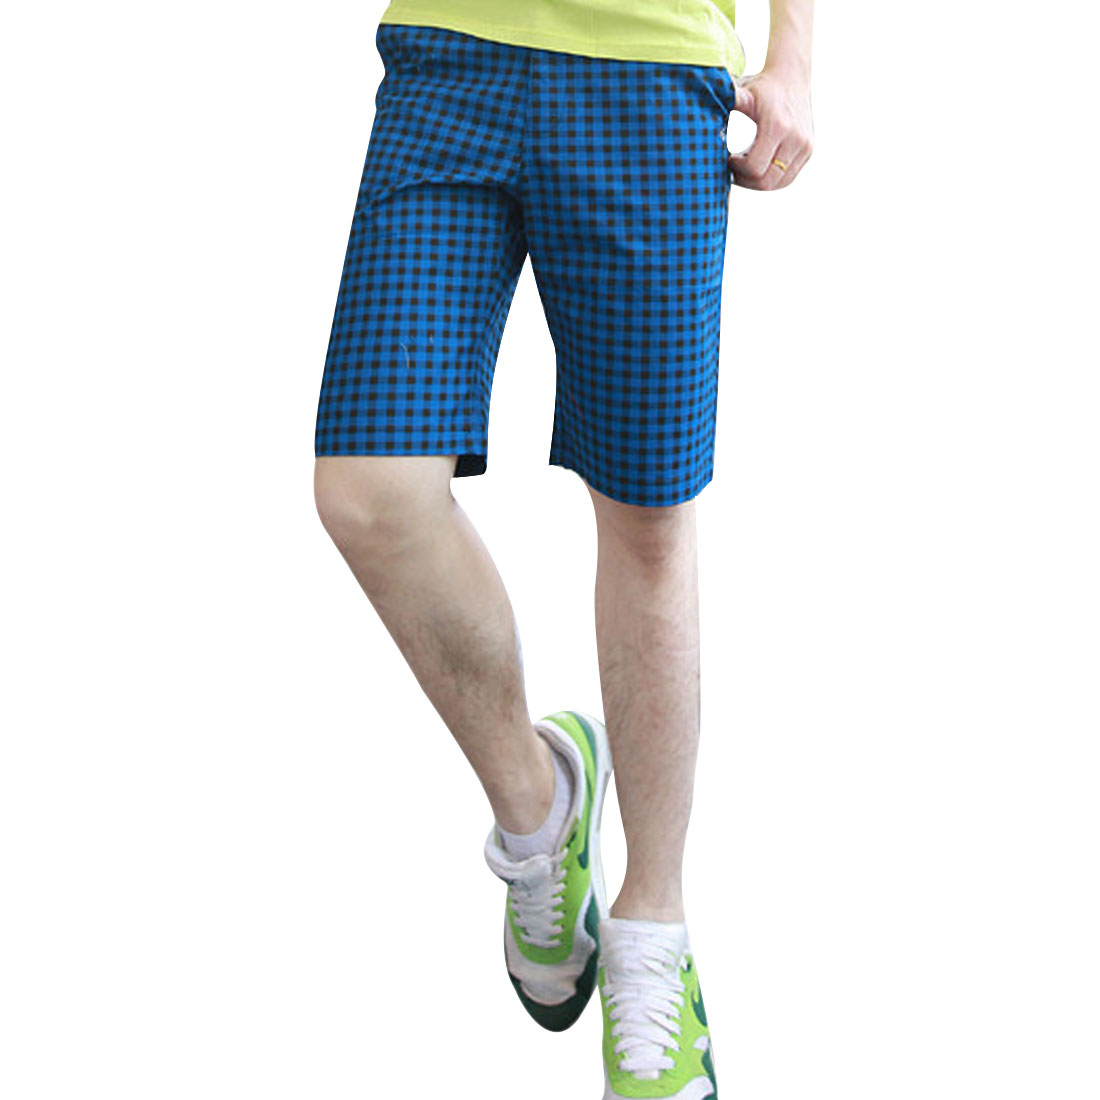 Men Flap Hip Pockets Plaids Prints Zipper Shorts Peacock Blue W33